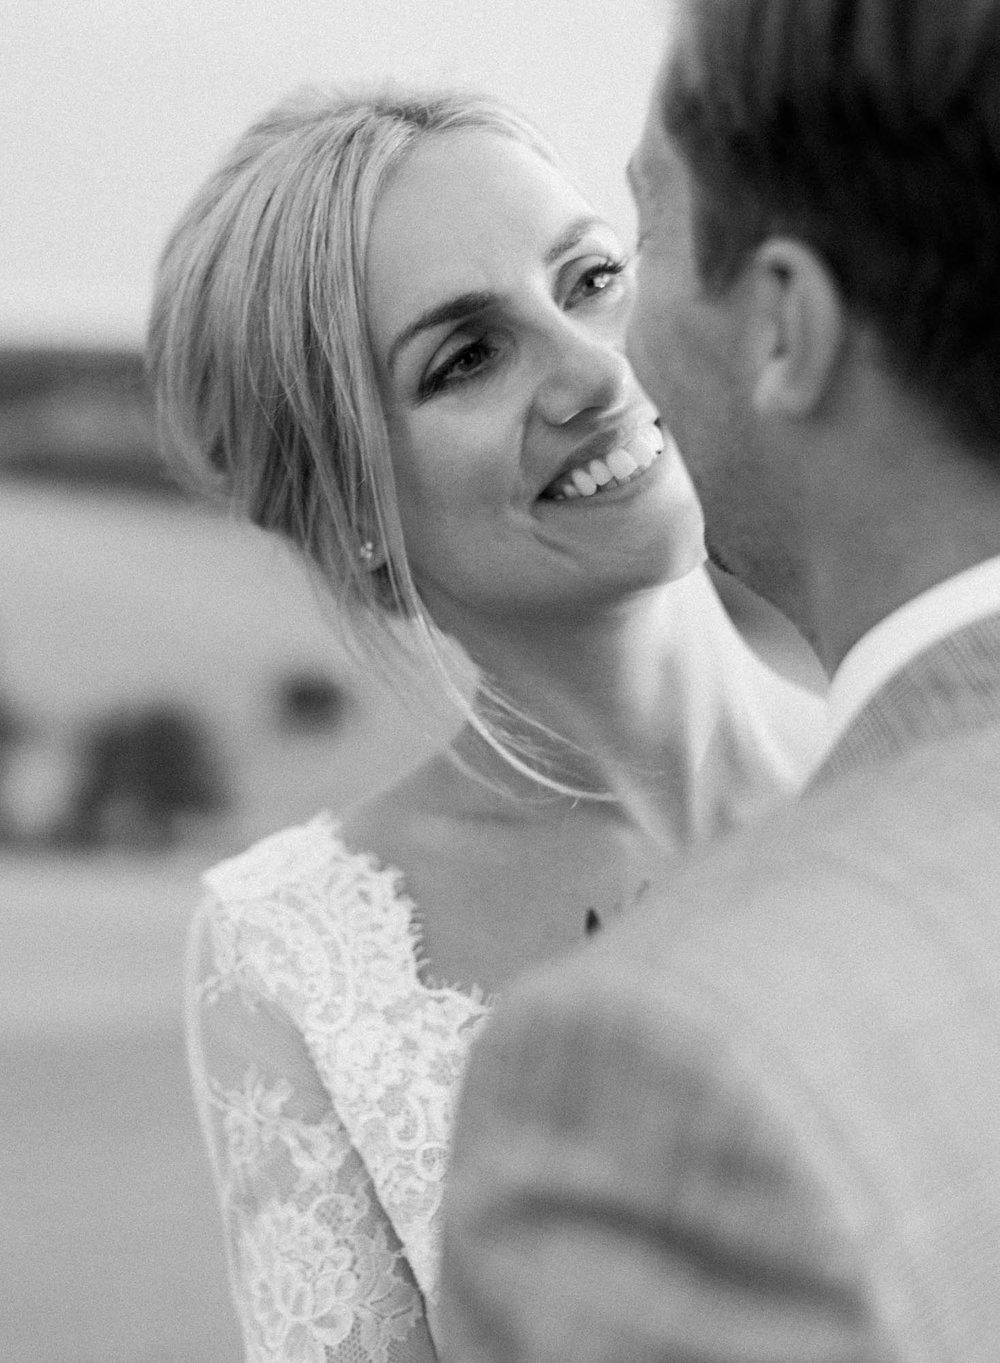 gascony_french_wedding-78.jpg